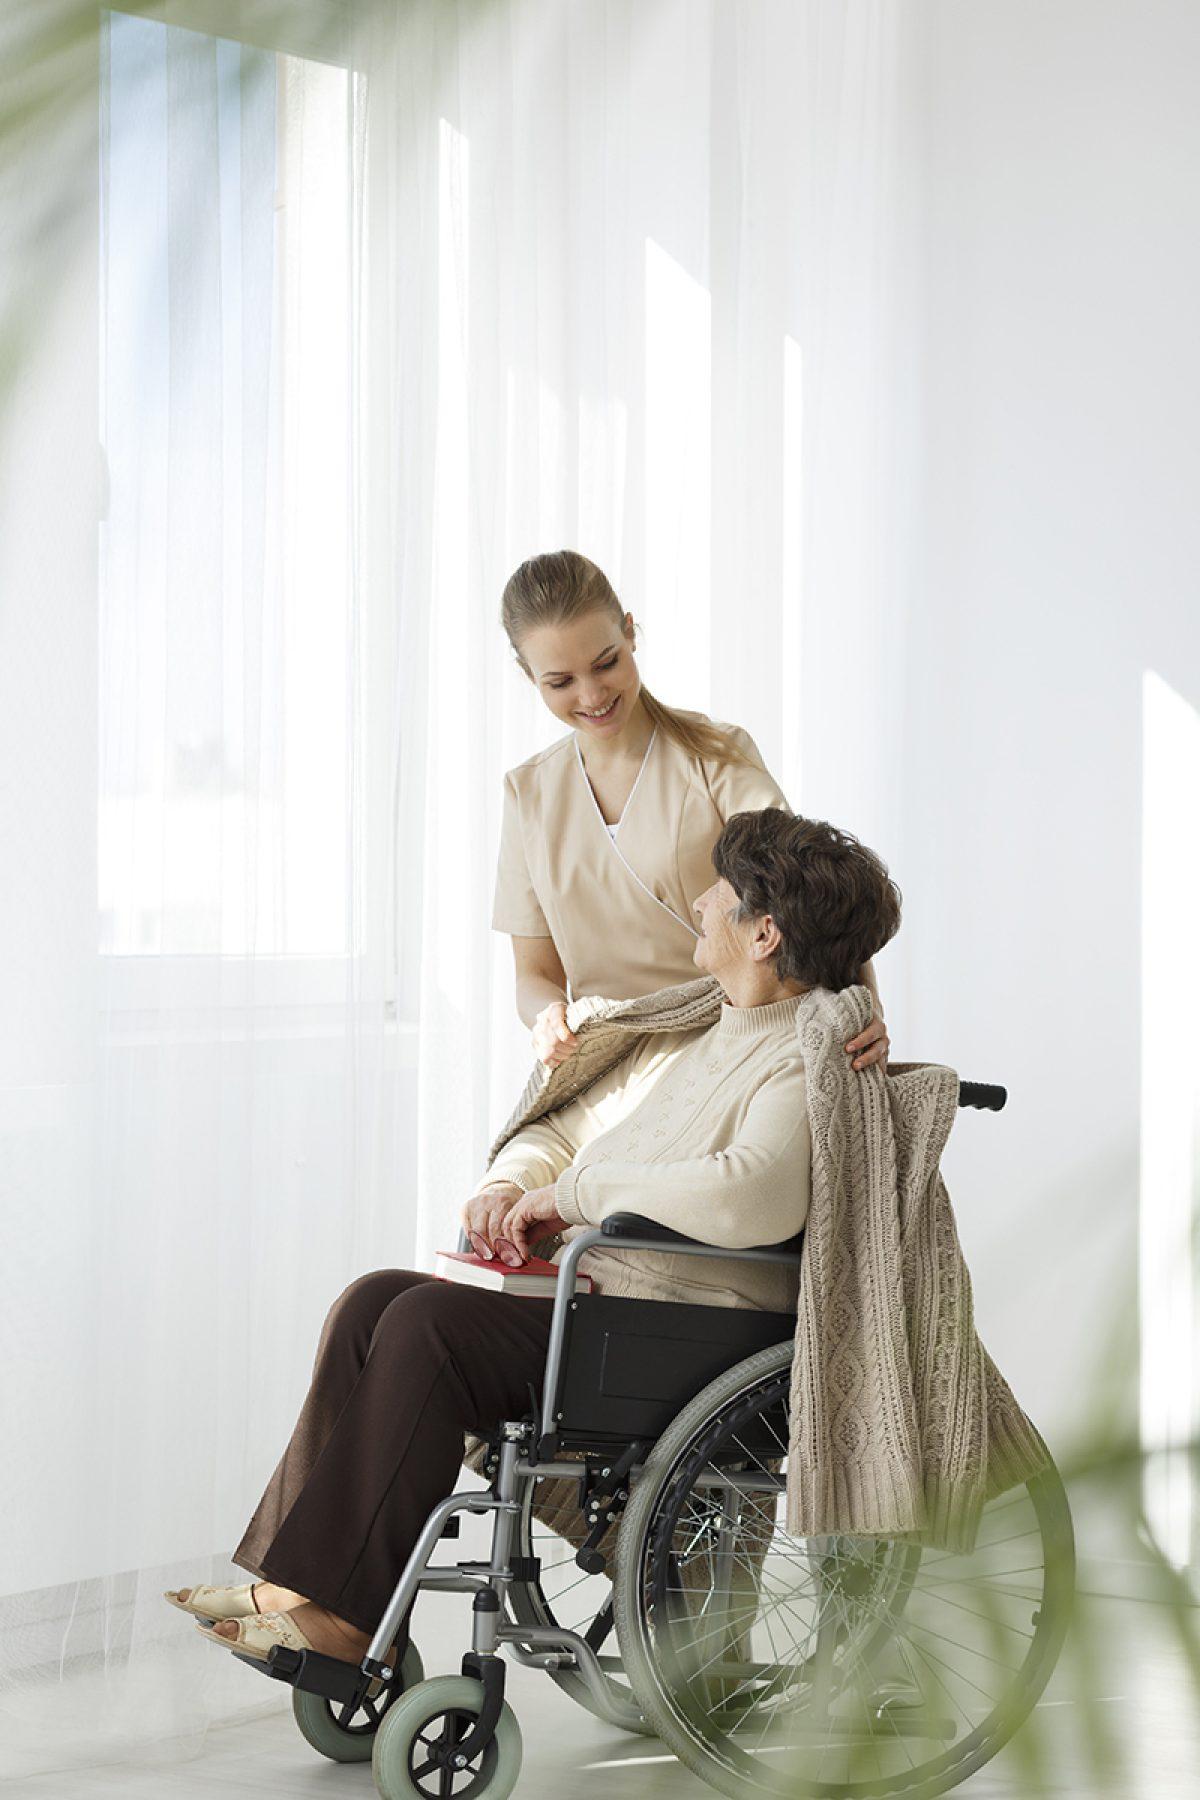 Nurse covering lady with blanket PNU3 AFM